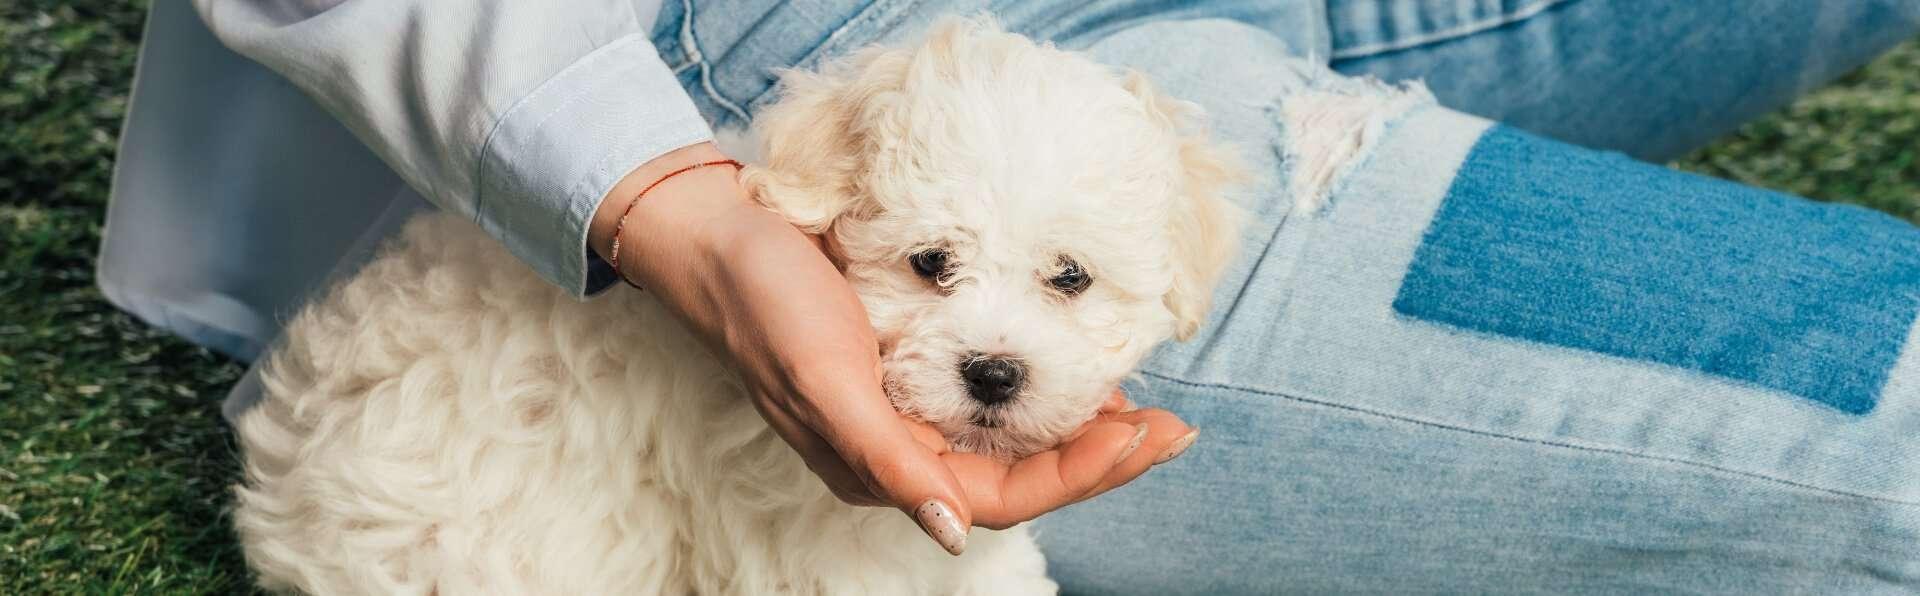 adorable havanese puppy